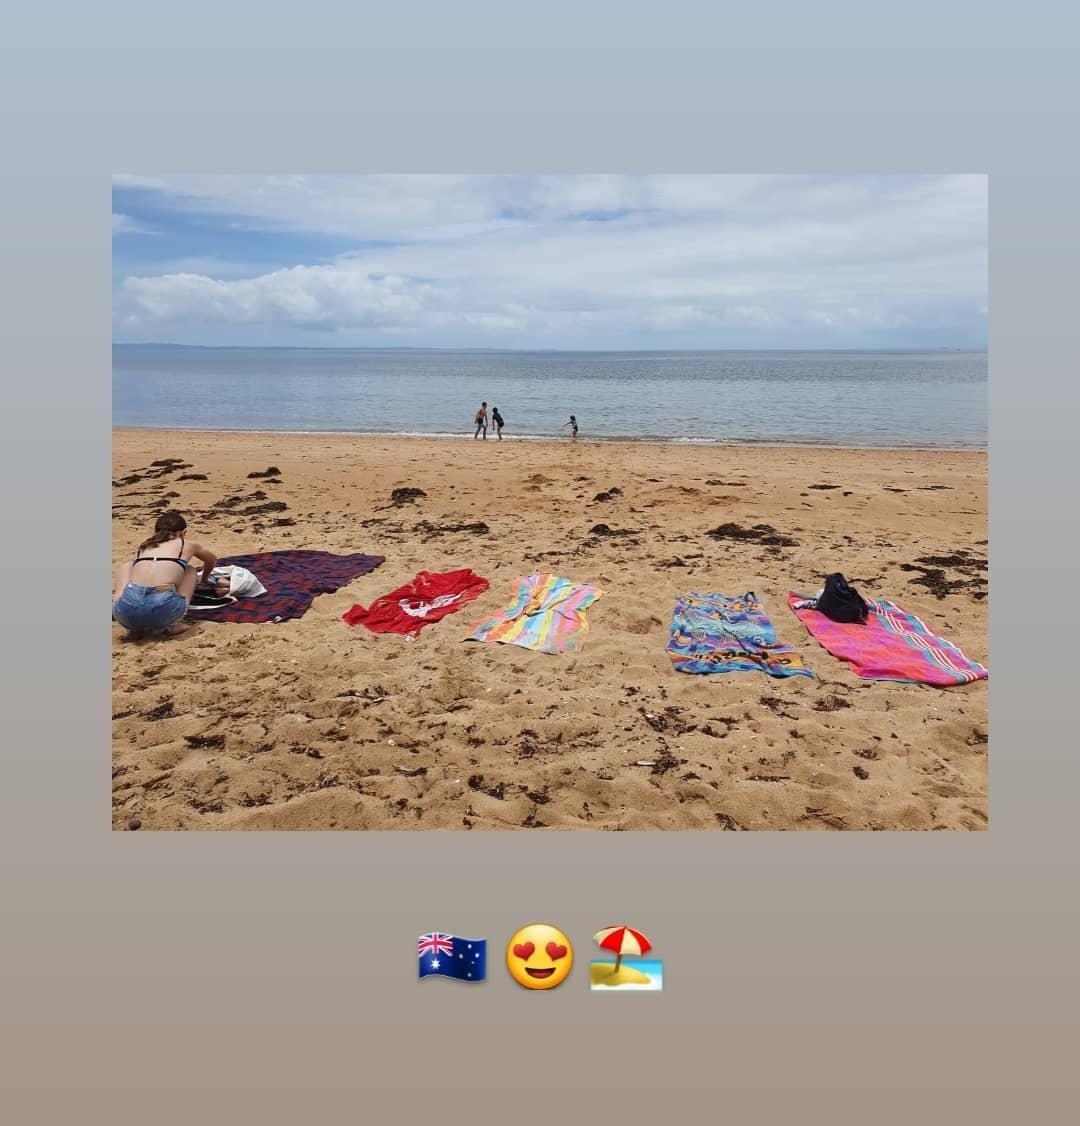 Happy Australia Day #celebrating #AustraliaDay #Australia #queensland #beach #family 🇭🇲